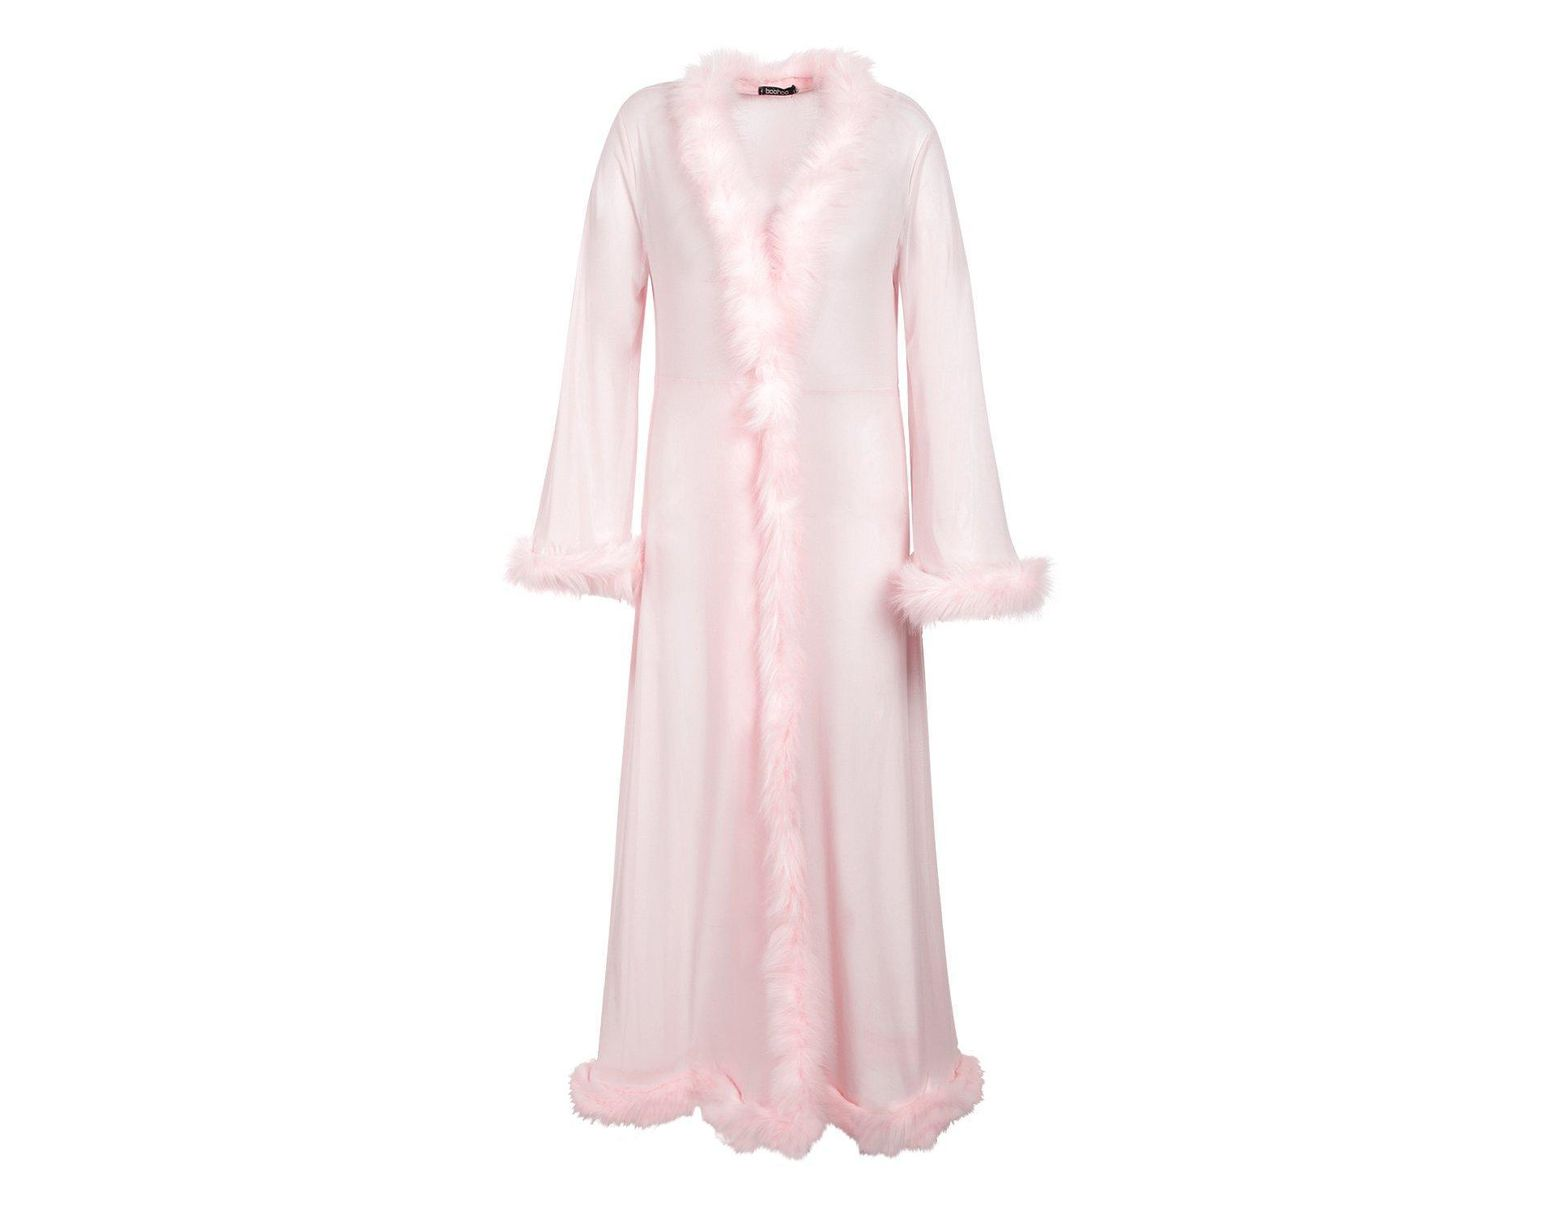 b1bf888cef18 Boohoo Plus Gemma Collins Kimono Robe With Fluffy Trim in Pink - Lyst